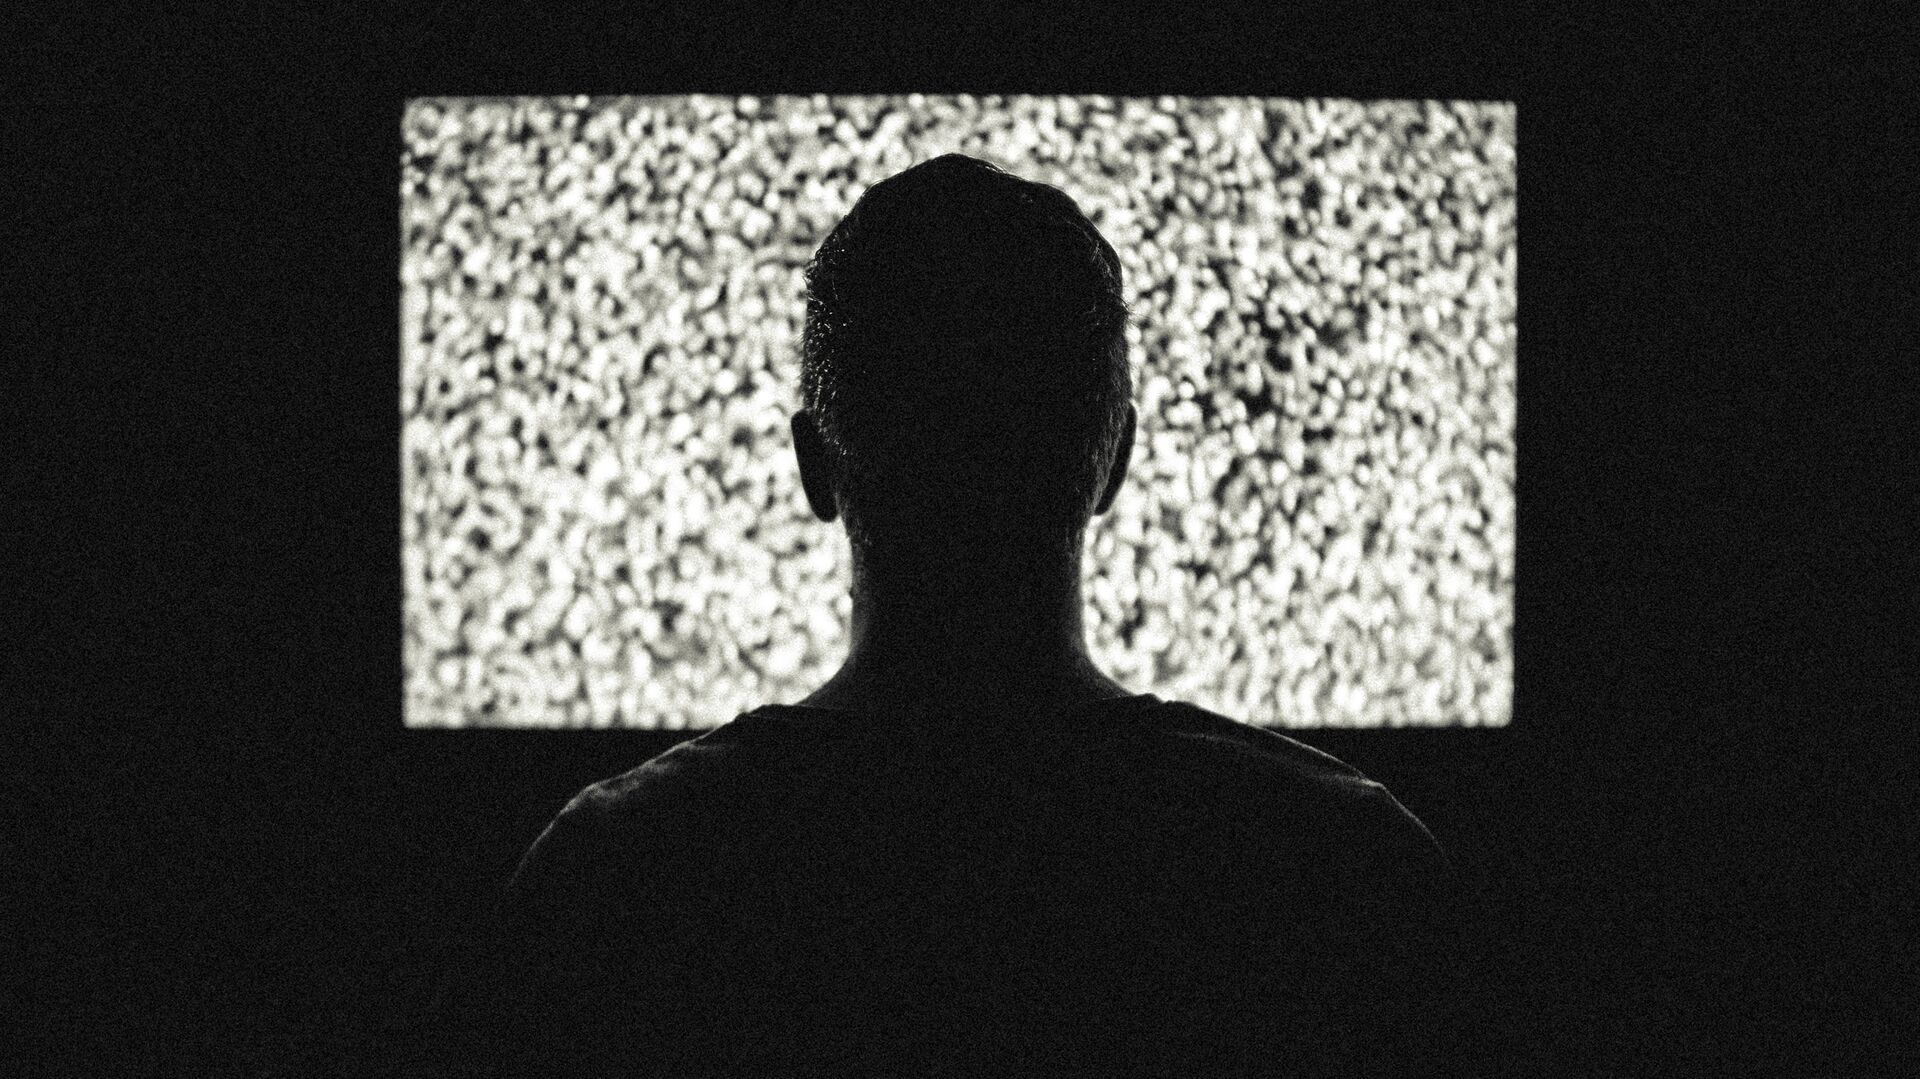 Un televisor, imagen referencial - Sputnik Mundo, 1920, 21.08.2021